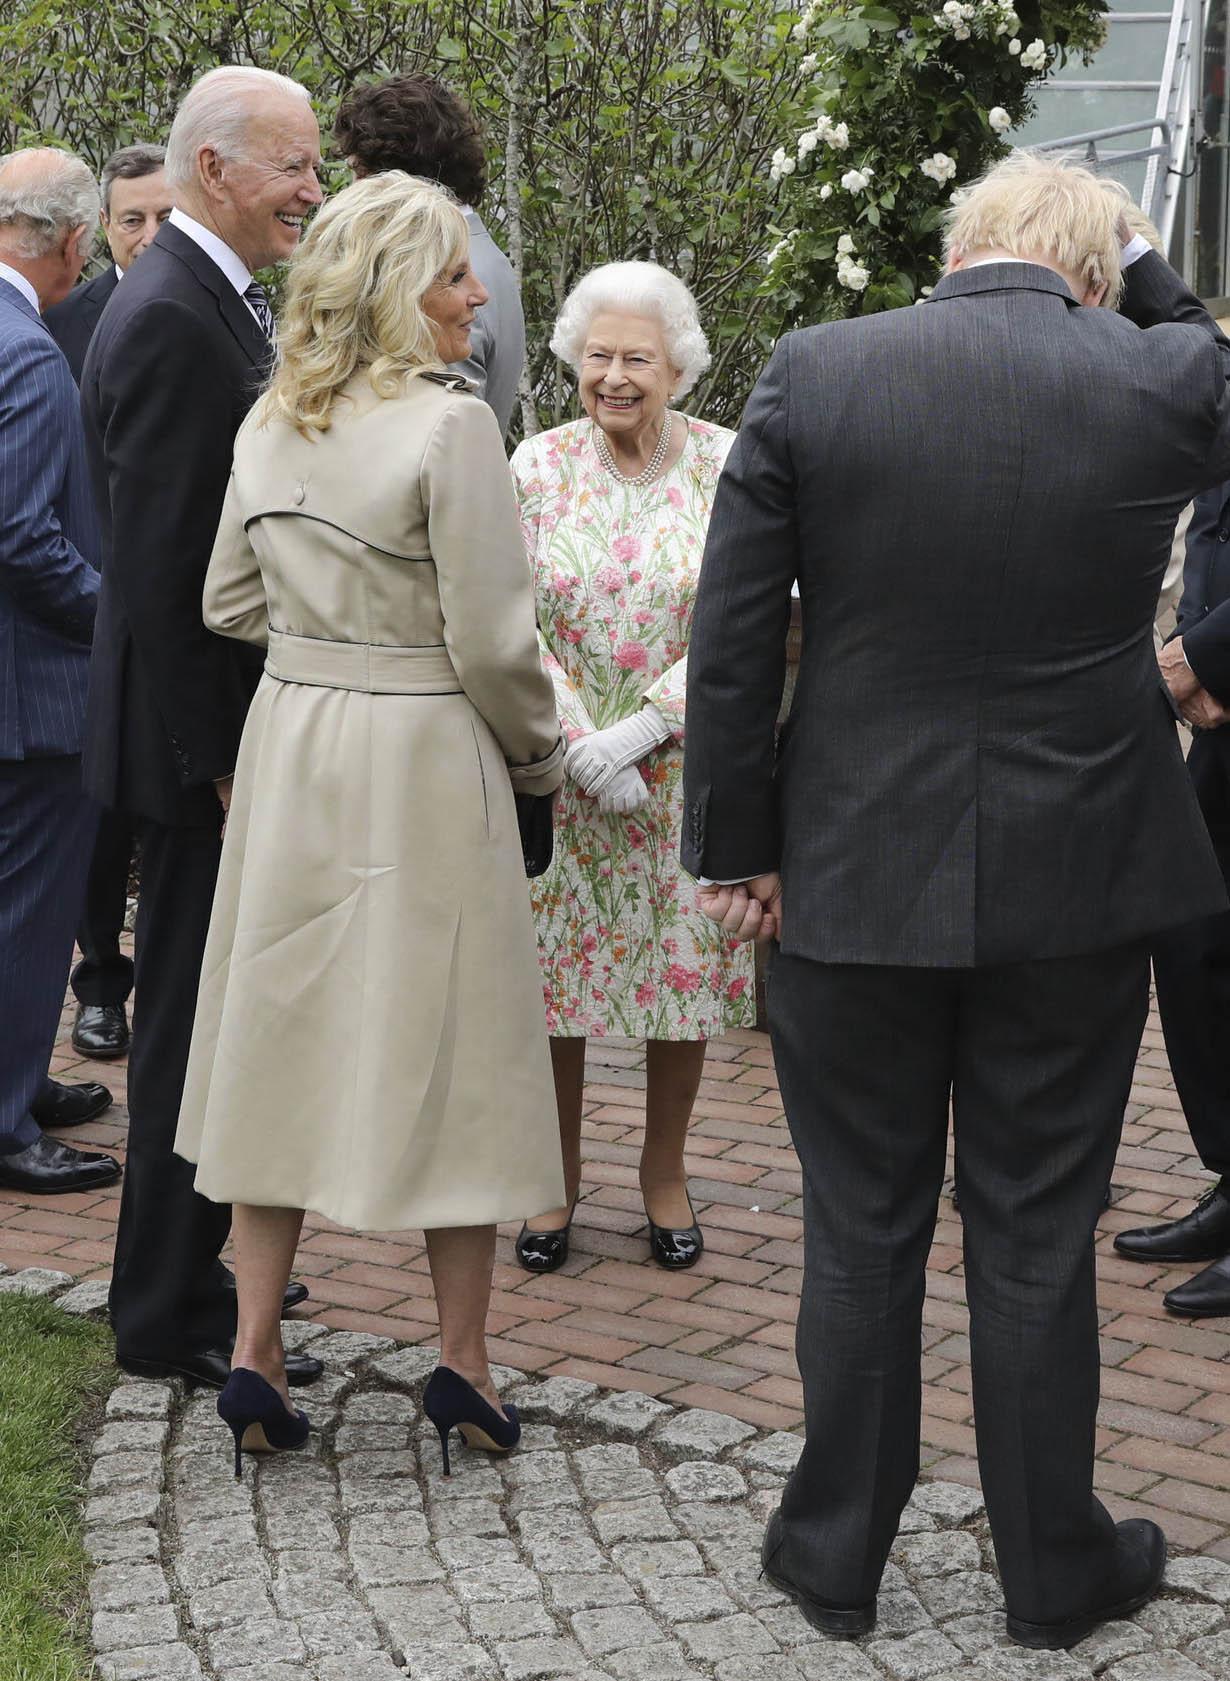 jill-biden-wears-trench-coat-pumps-to-meet-queen-elizabeth-at-g7-summit-reception